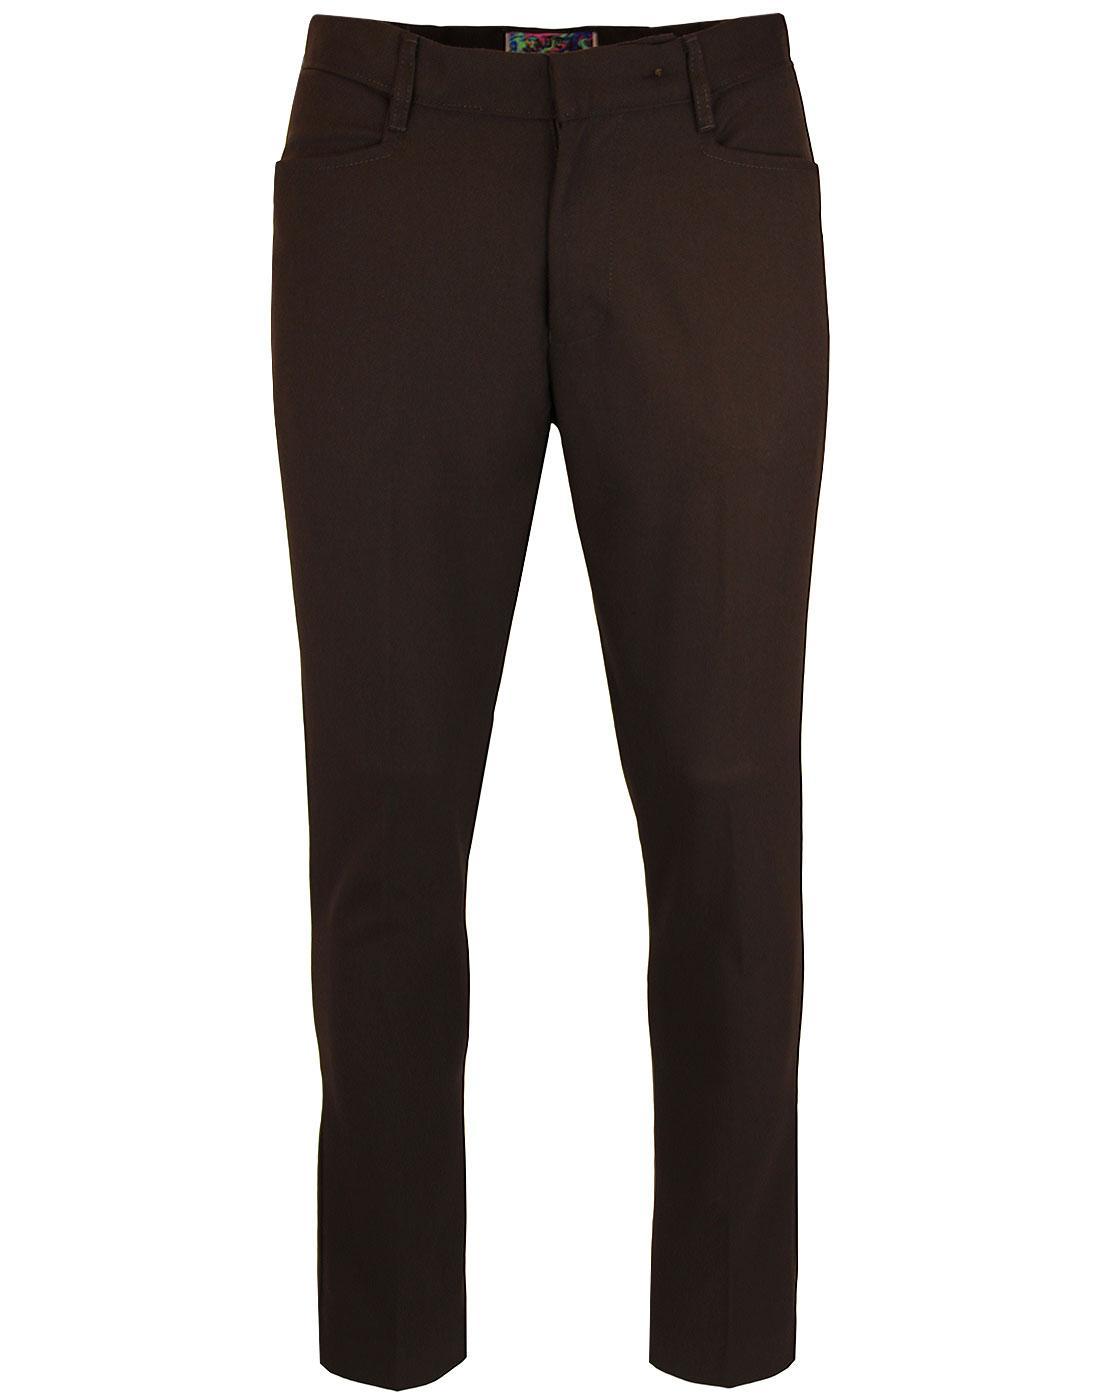 Logan Slim MADCAP ENGLAND Mod Hopsack Trousers Br